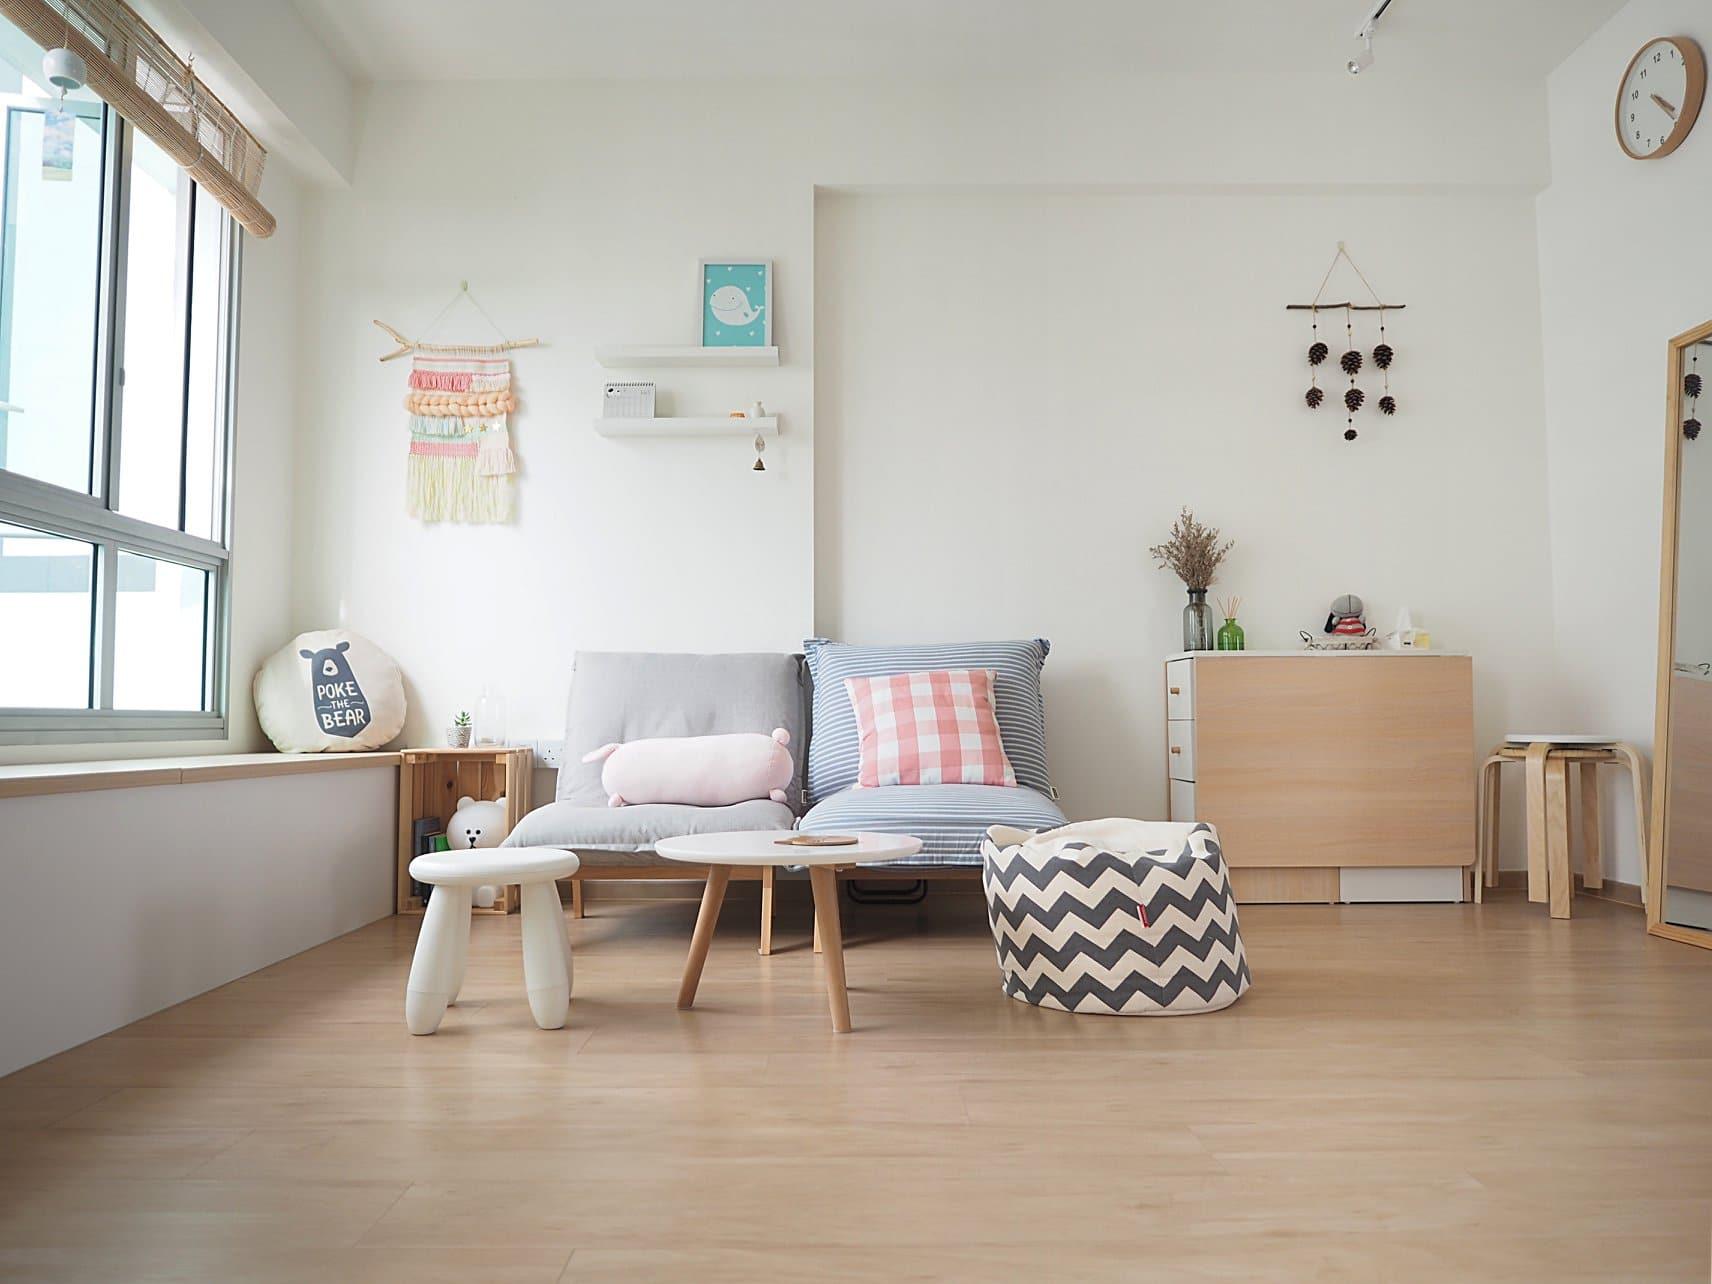 Minimalist Scandinavian 10 - 28+ Interior Design For Small Houses Pics